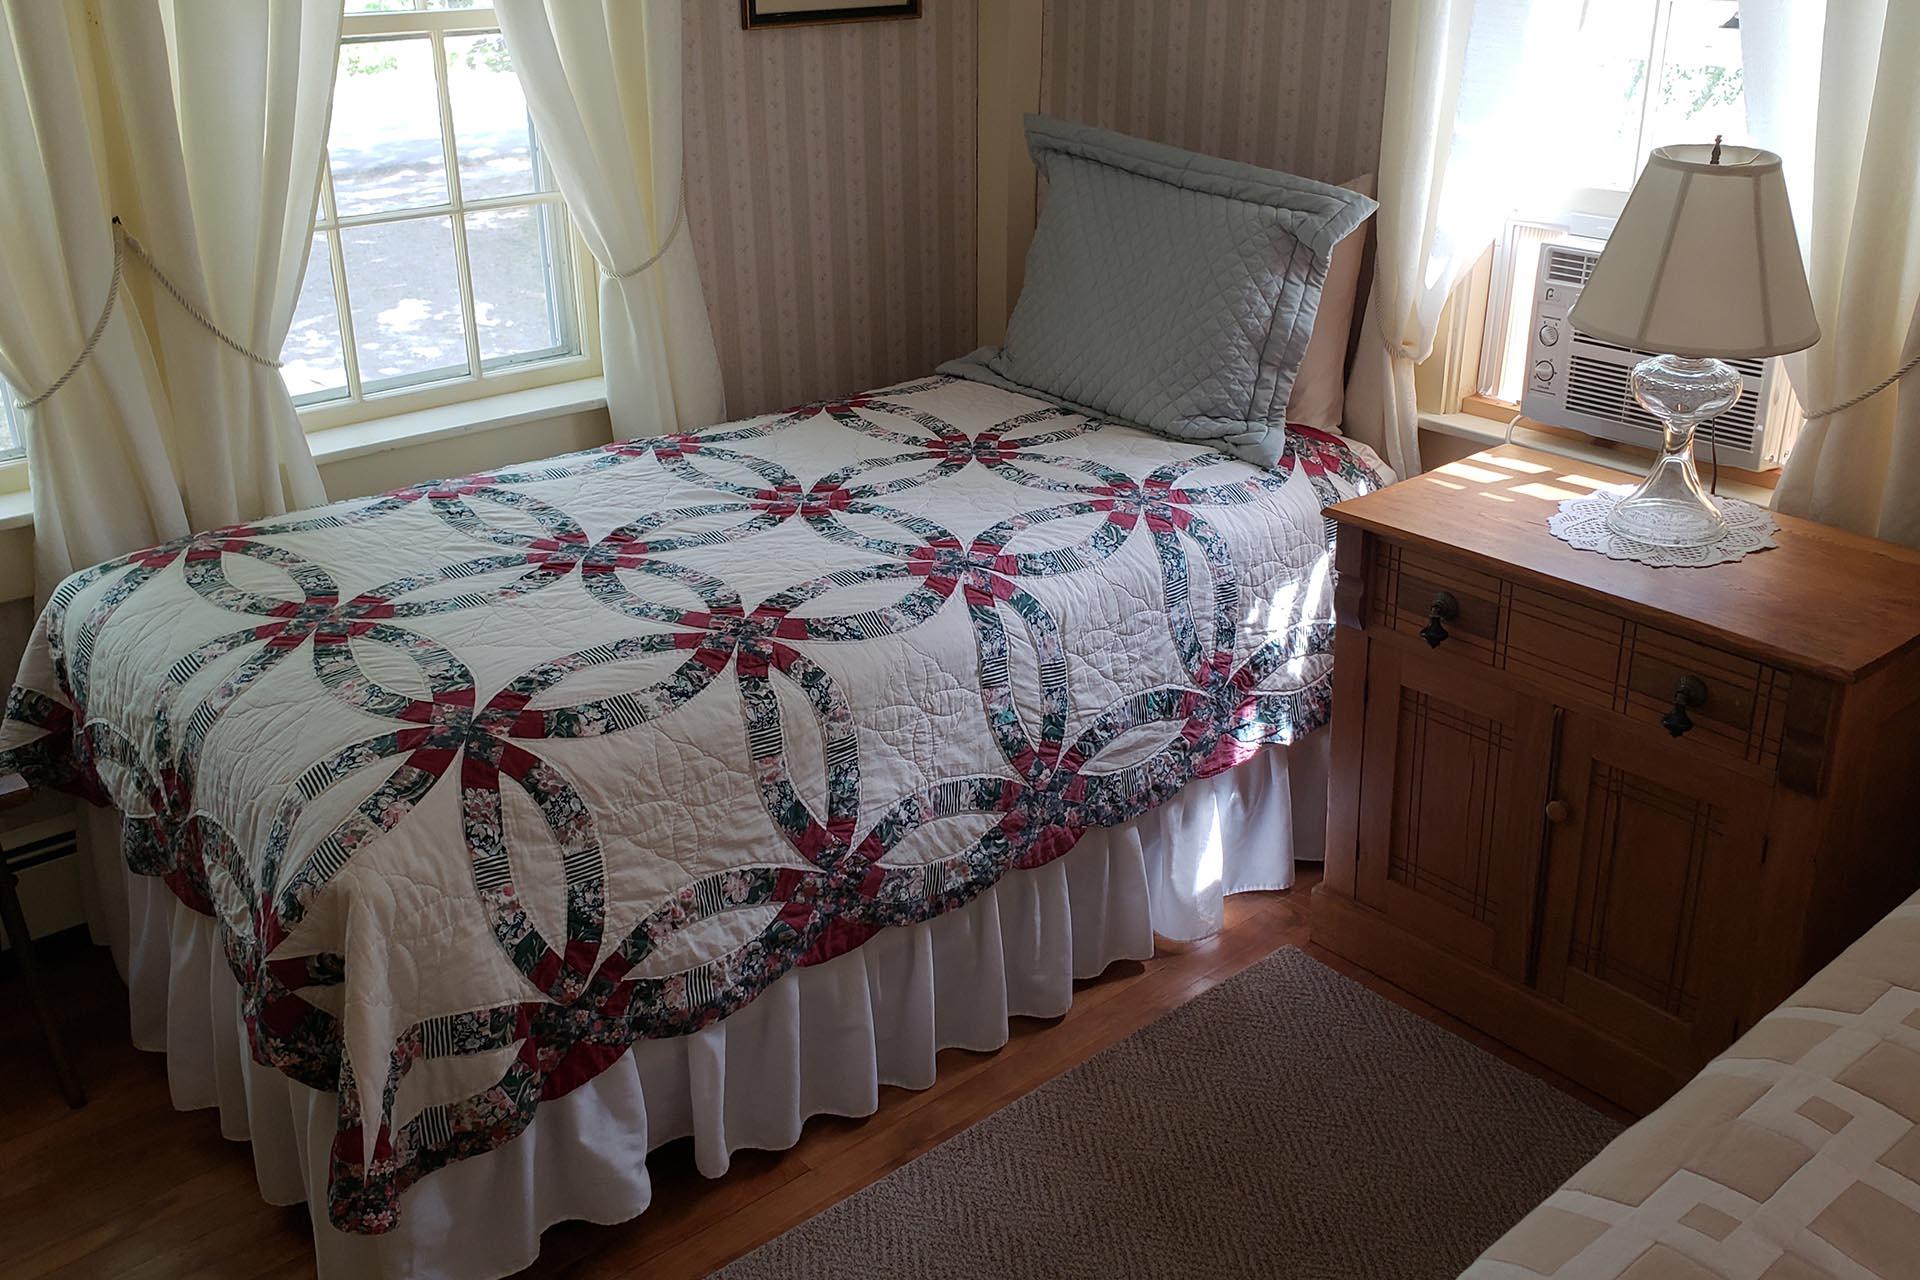 Hawks Inn Room 3